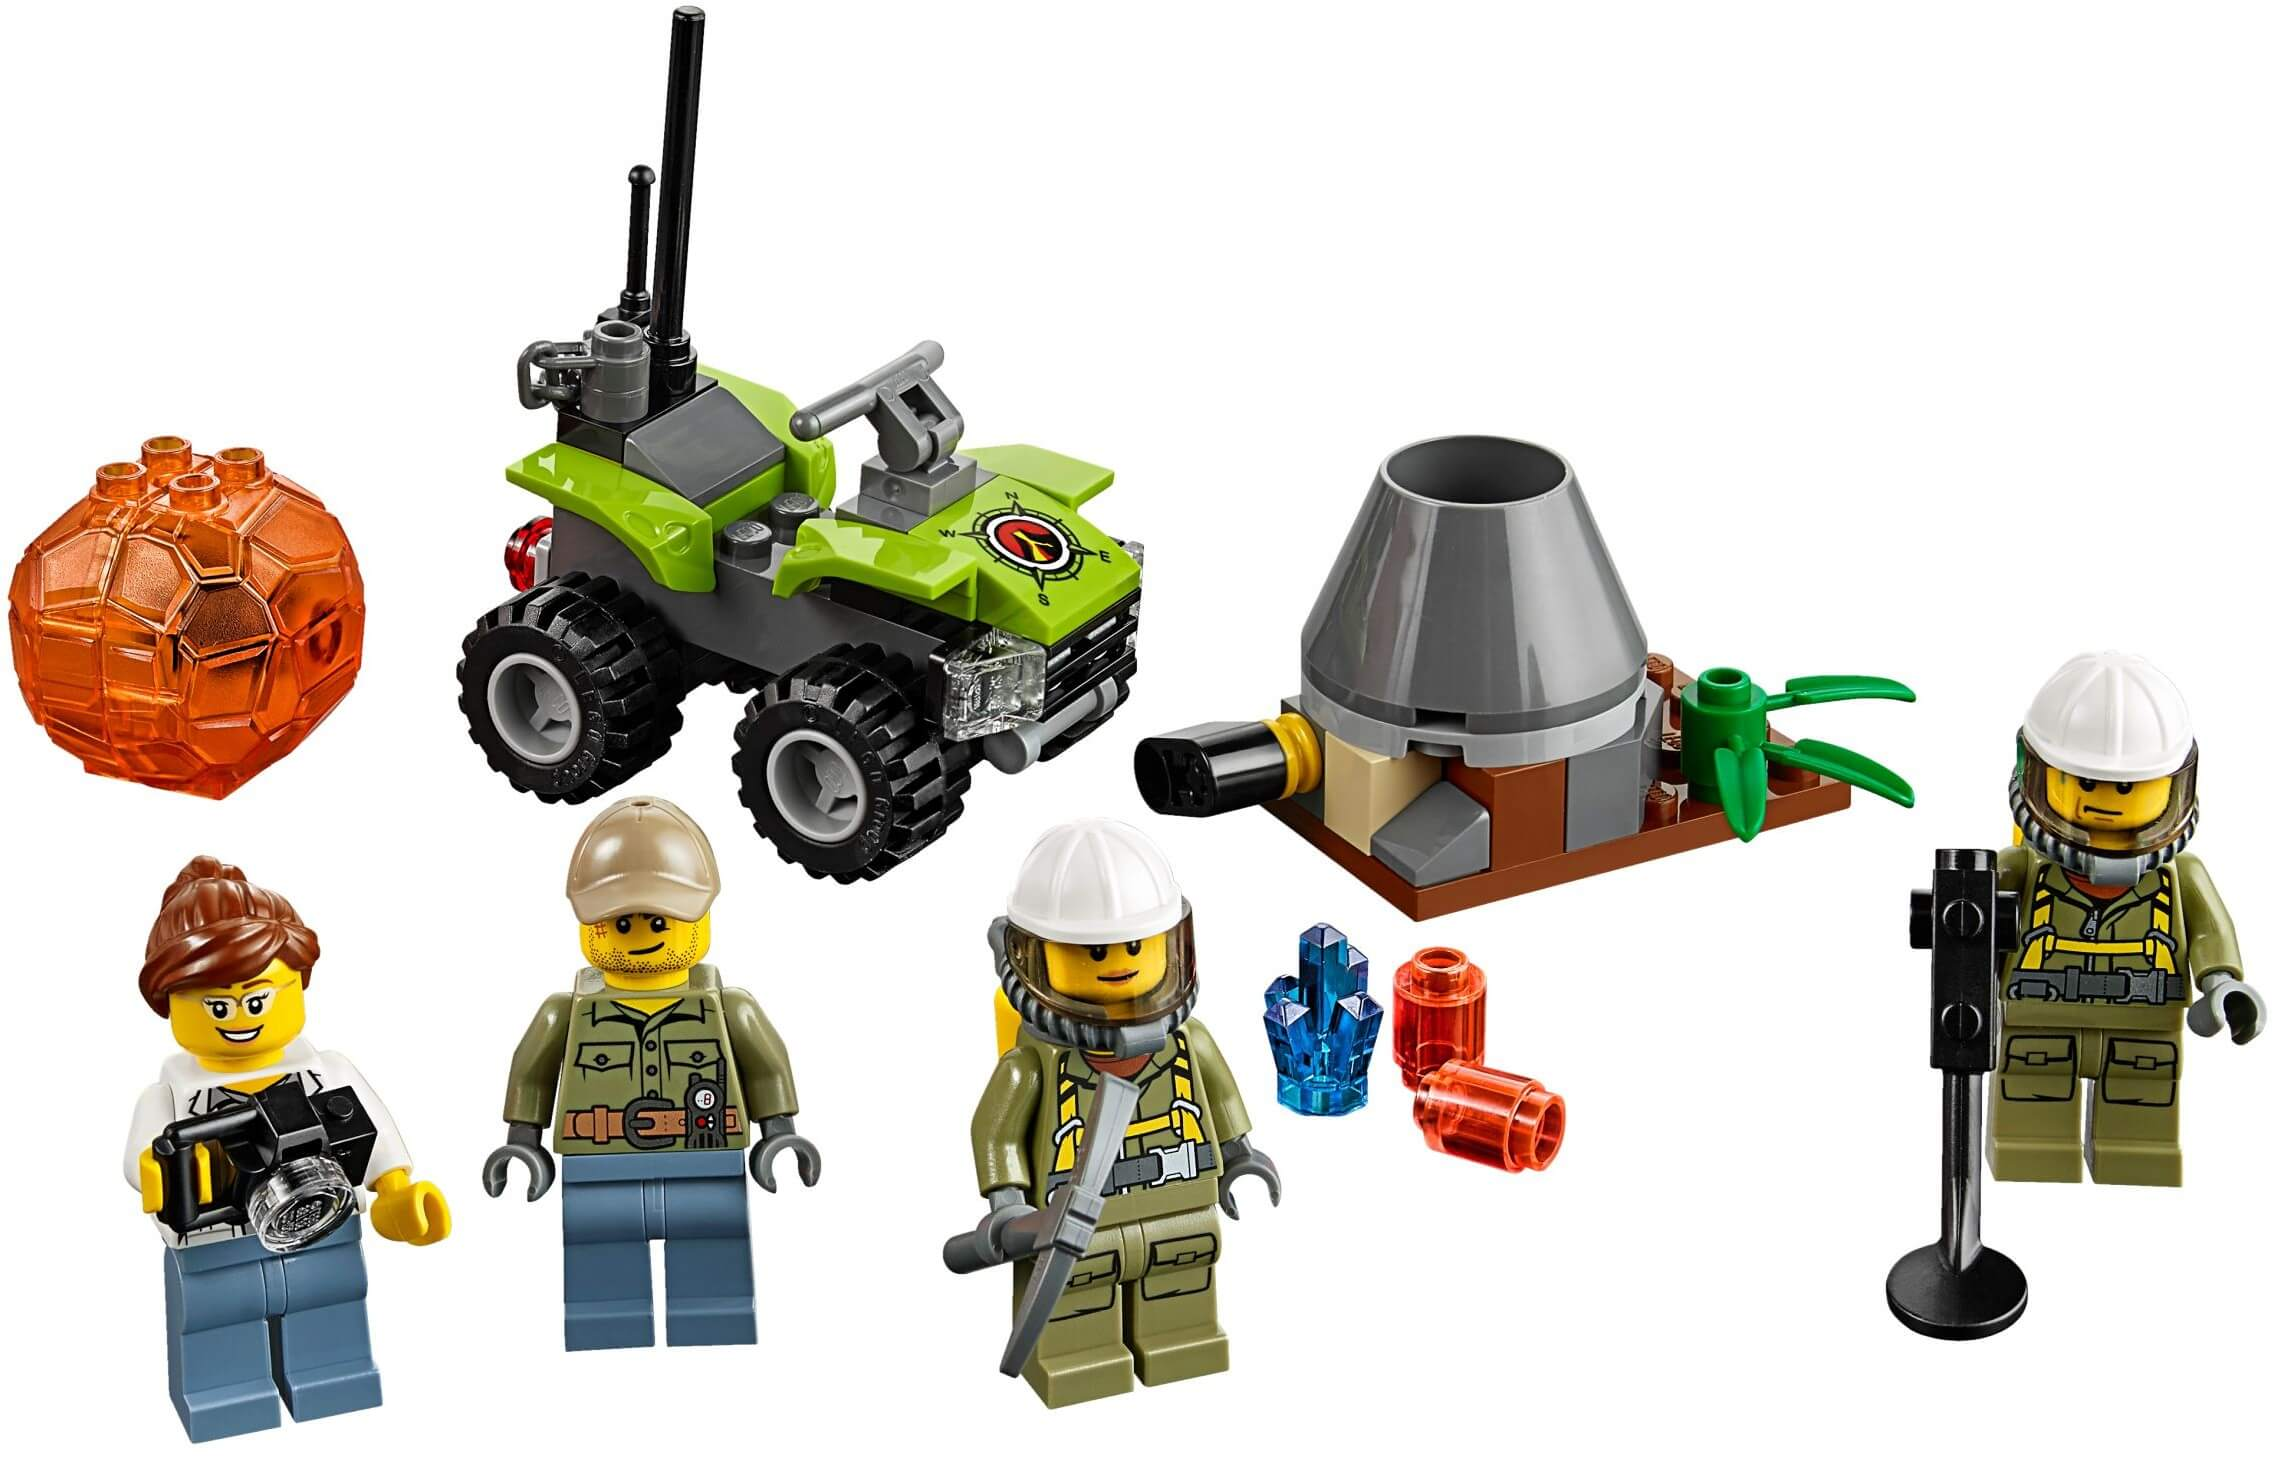 Mua đồ chơi LEGO 60120 - LEGO City 60120 - Đội Thám Hiểm Núi Lửa (LEGO City Volcano Starter Set 60120)